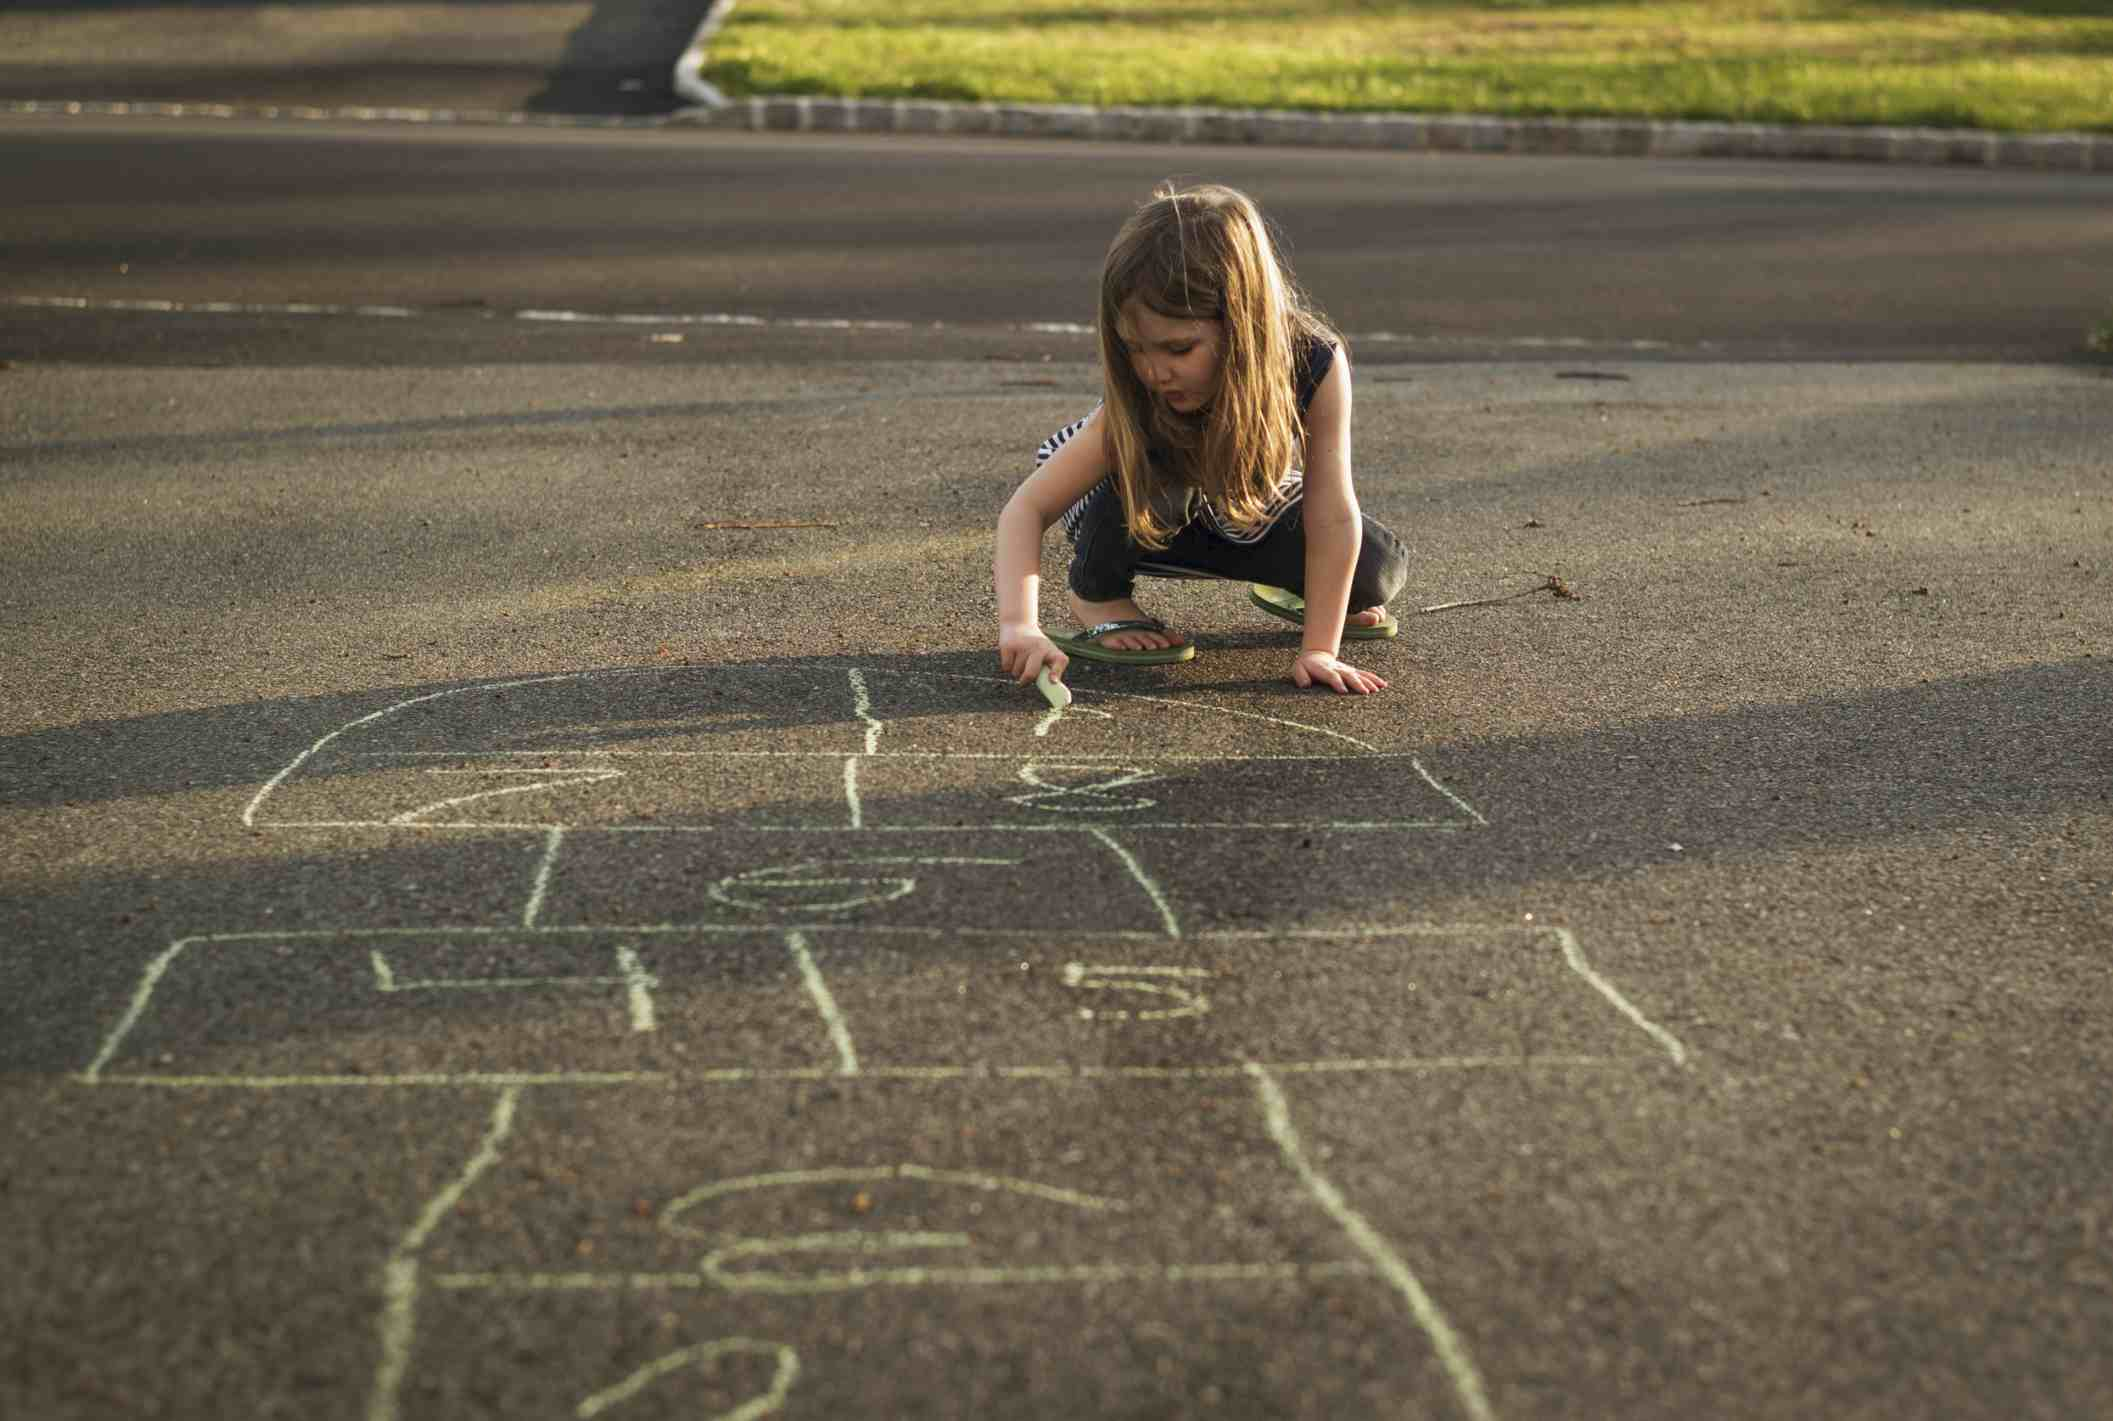 Girl drawing Hopscotch board